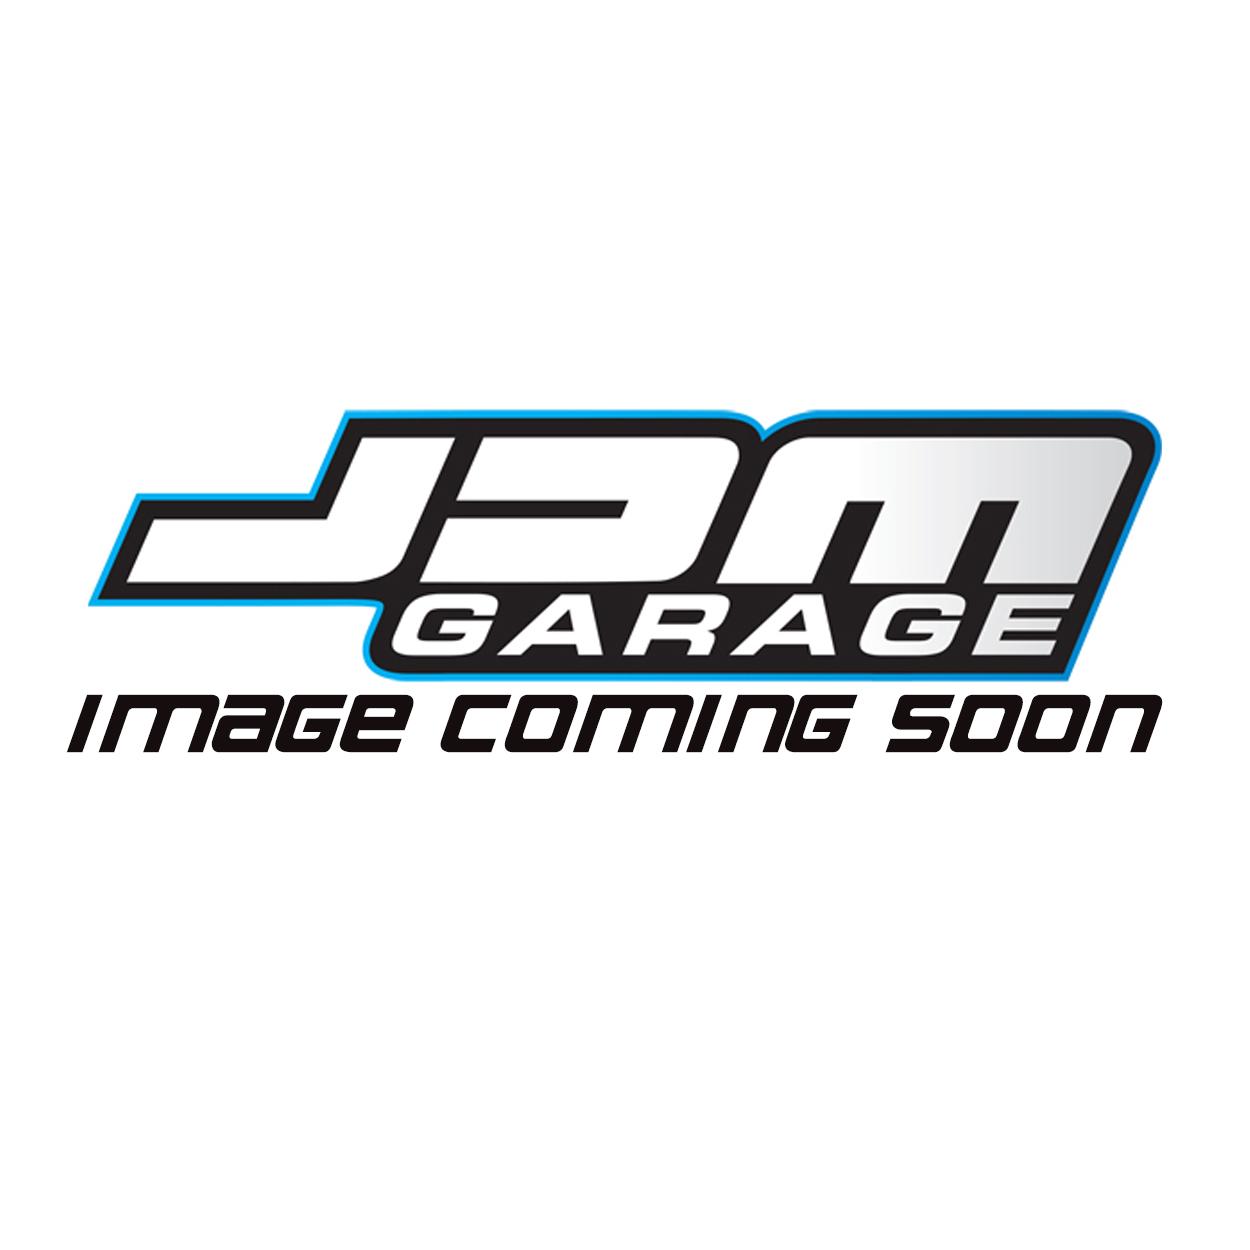 Genuine Nissan SpecR Rear Badge Emblem For Nissan Silvia S15 78896-91F00